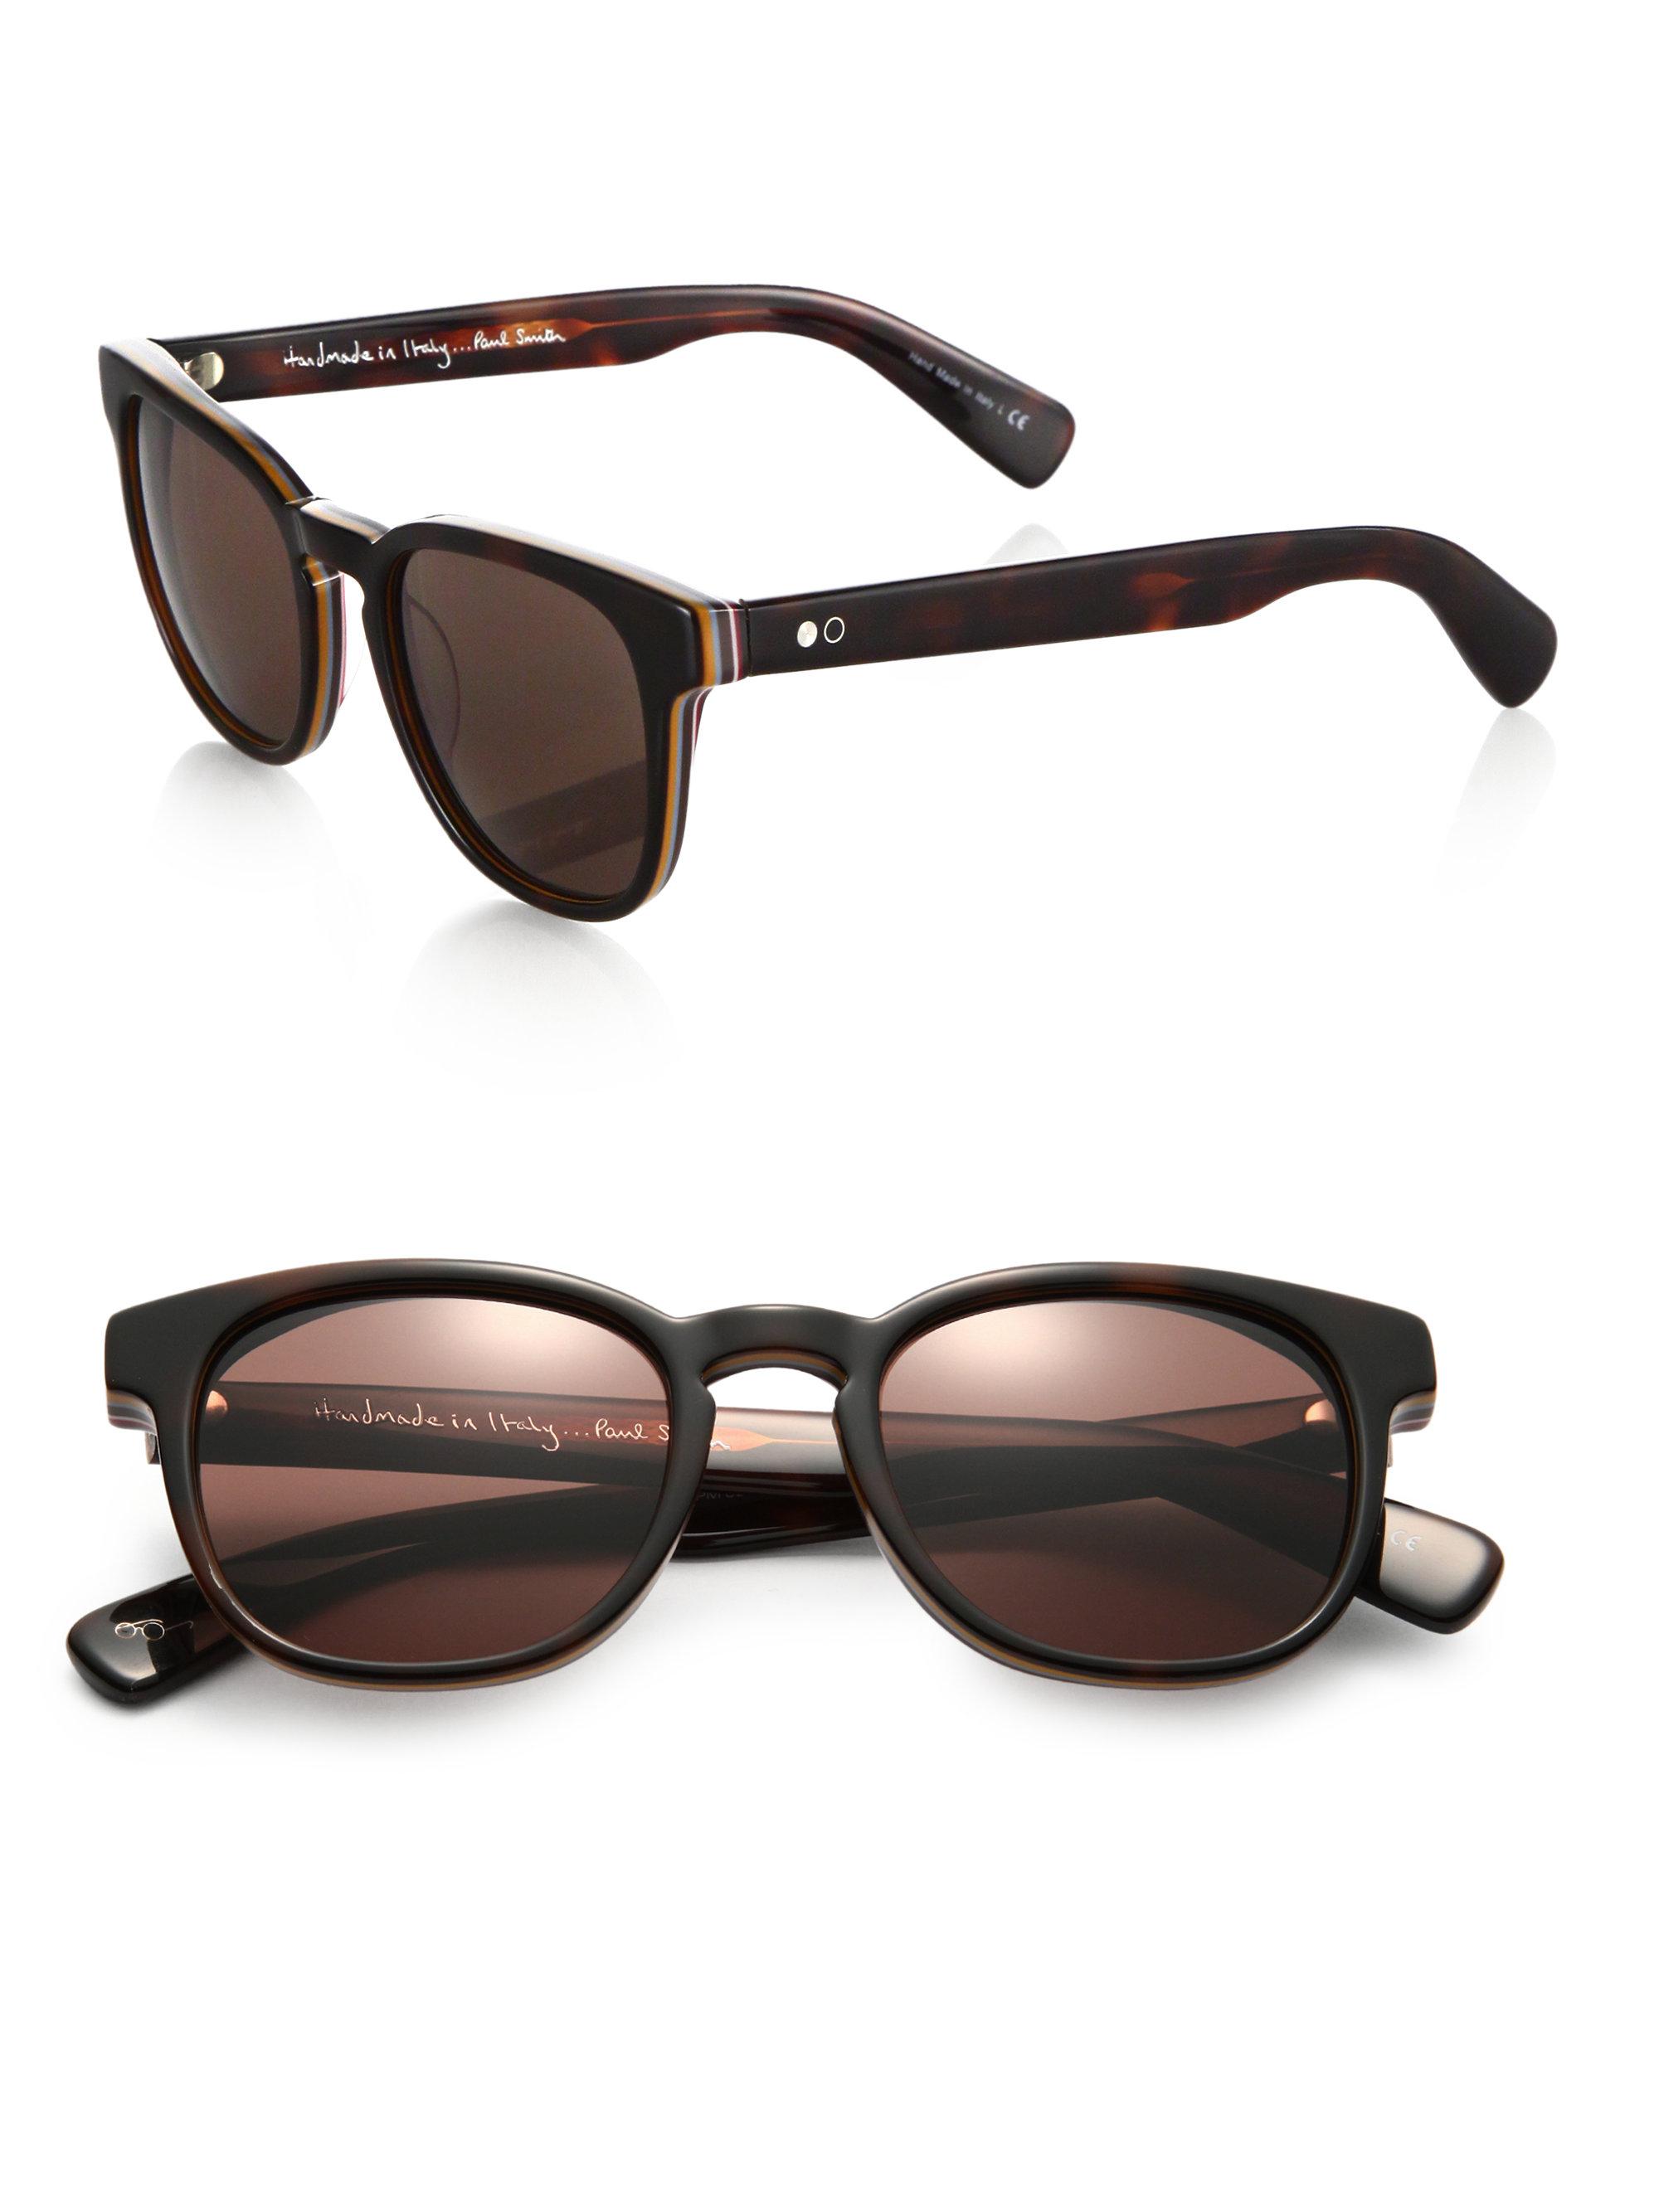 100ecca025 Paul Smith Sunglasses 2017 » Keymax.nl